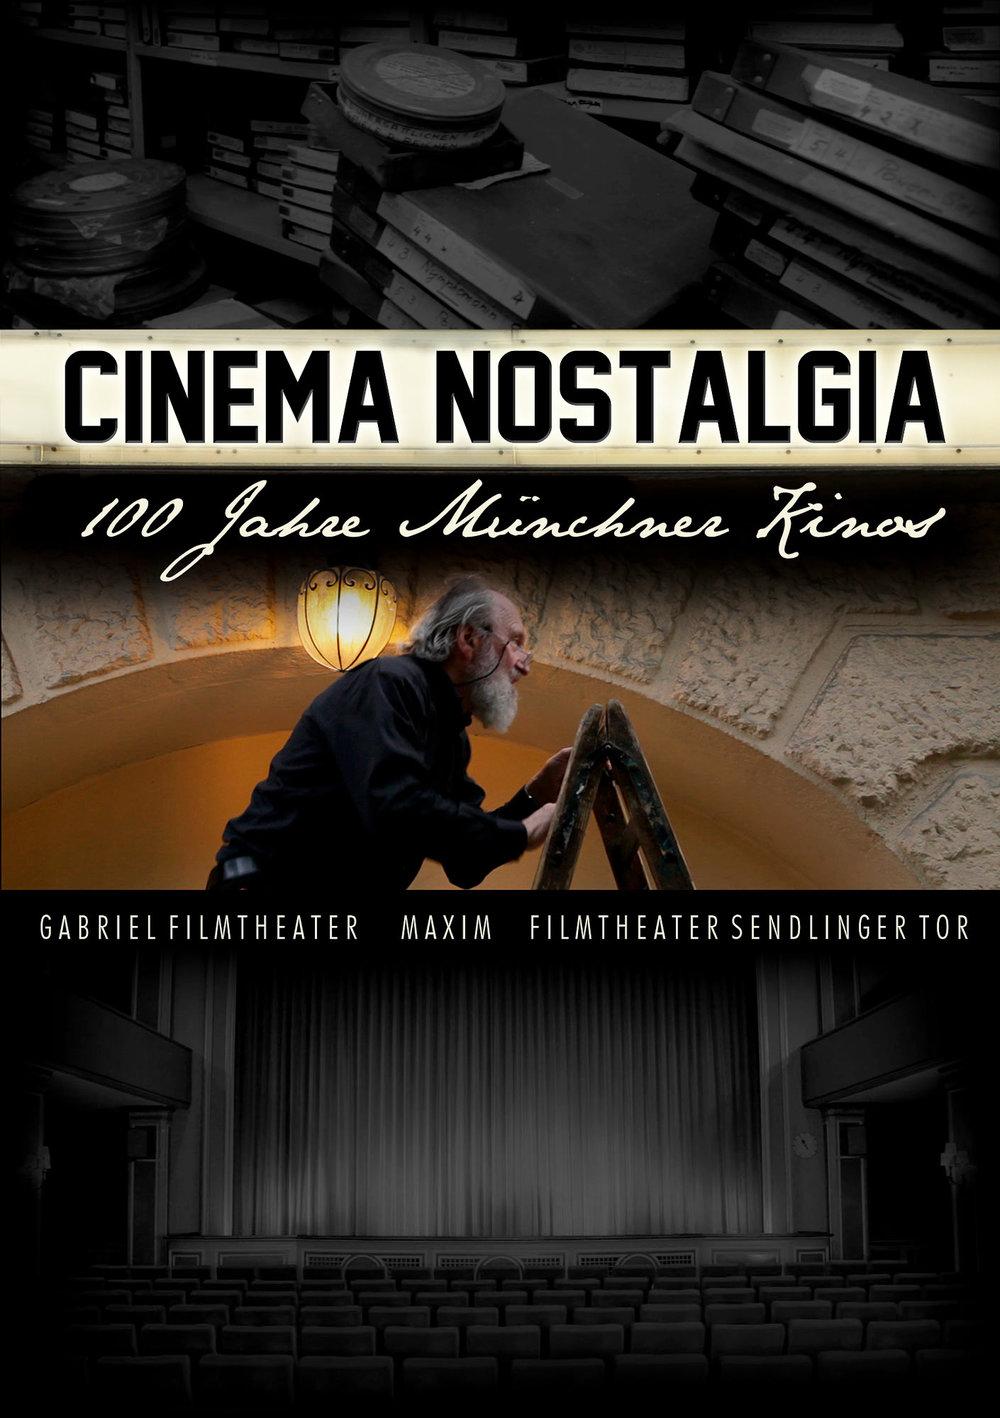 Cinema_Nostalgia_DVD_Cover_Internet.jpg